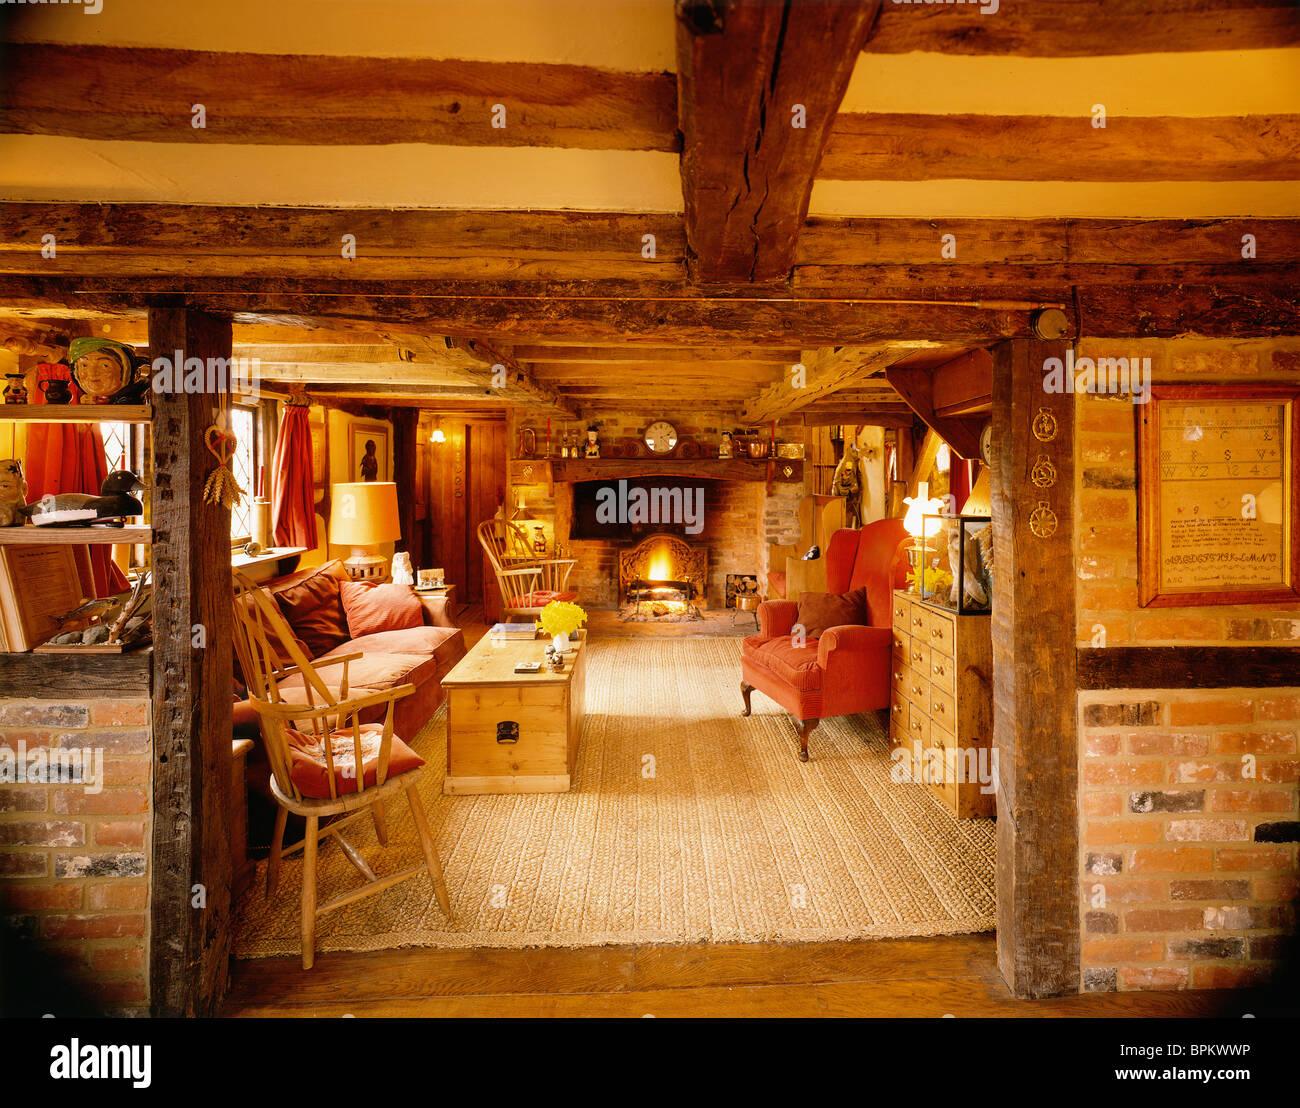 English Cottage Interior Stock Photos & English Cottage